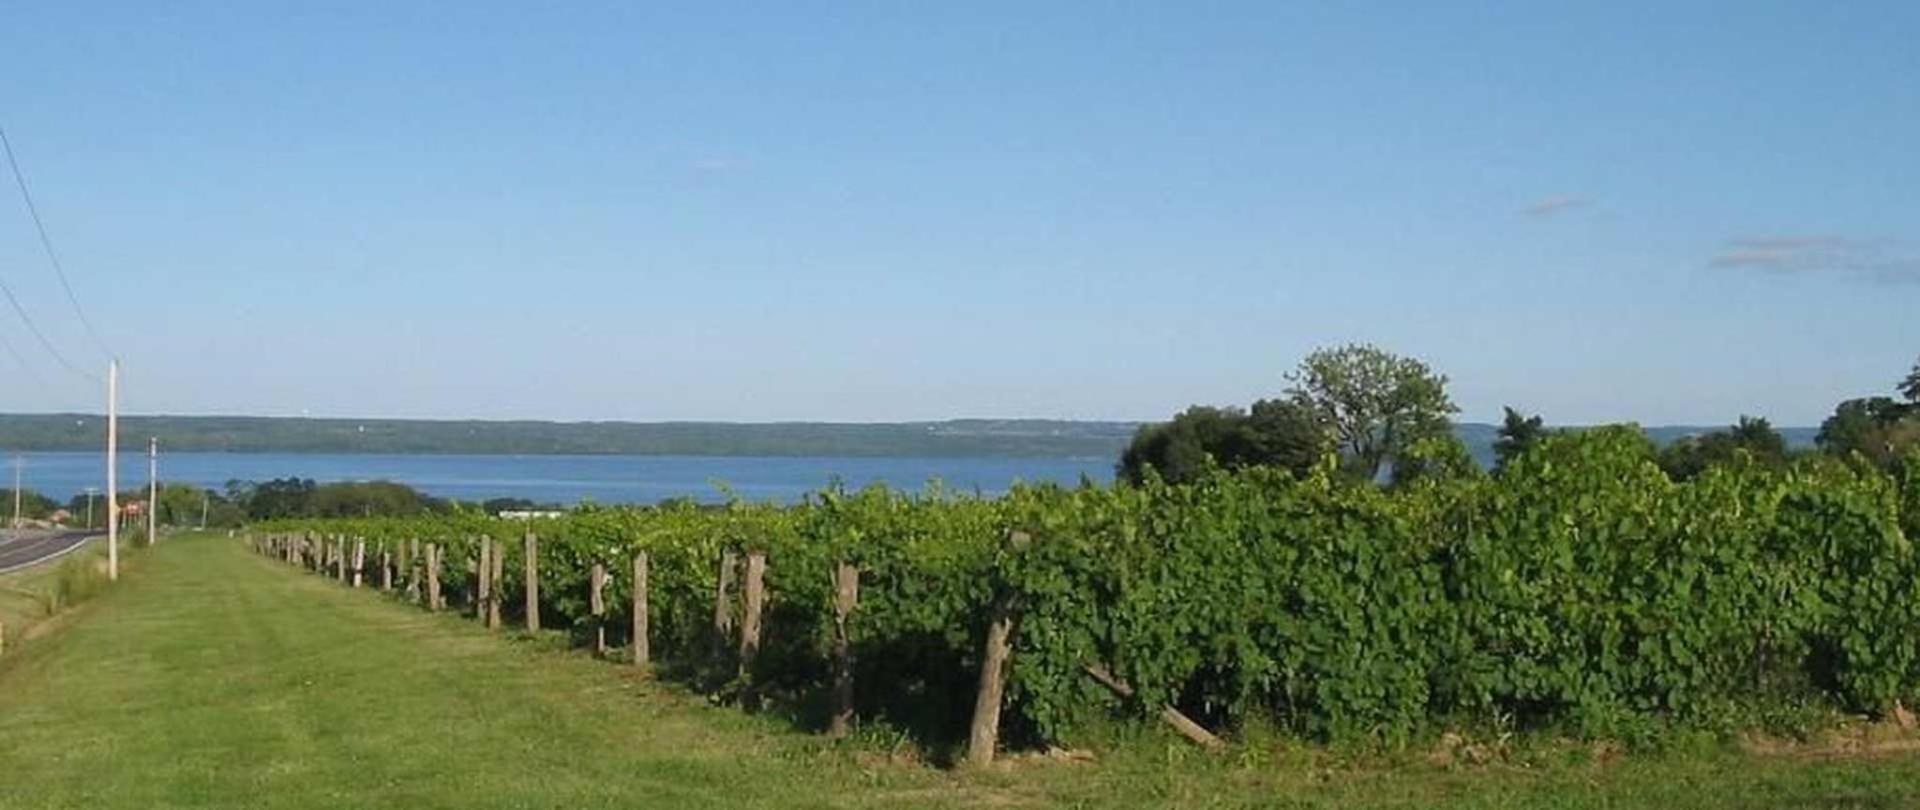 seneca-wine.JPG.1920x810_0_369_21006.jpeg